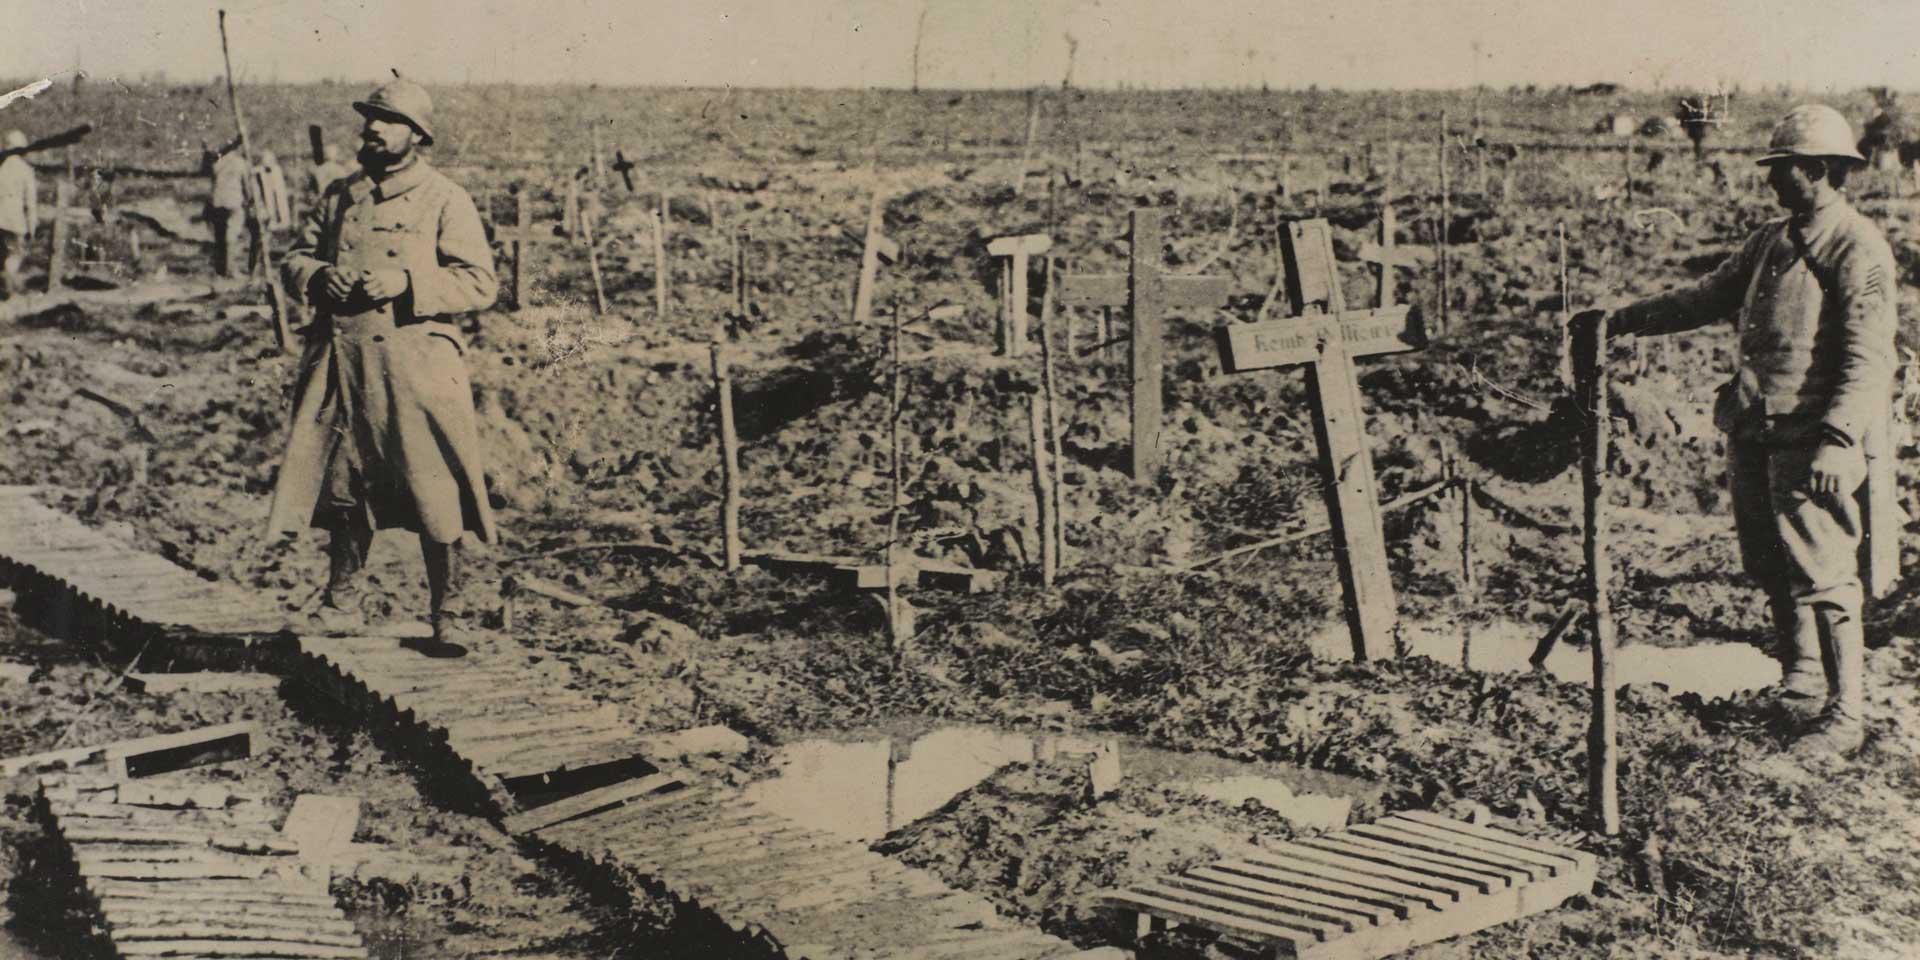 Graves at Passchendaele, 1917